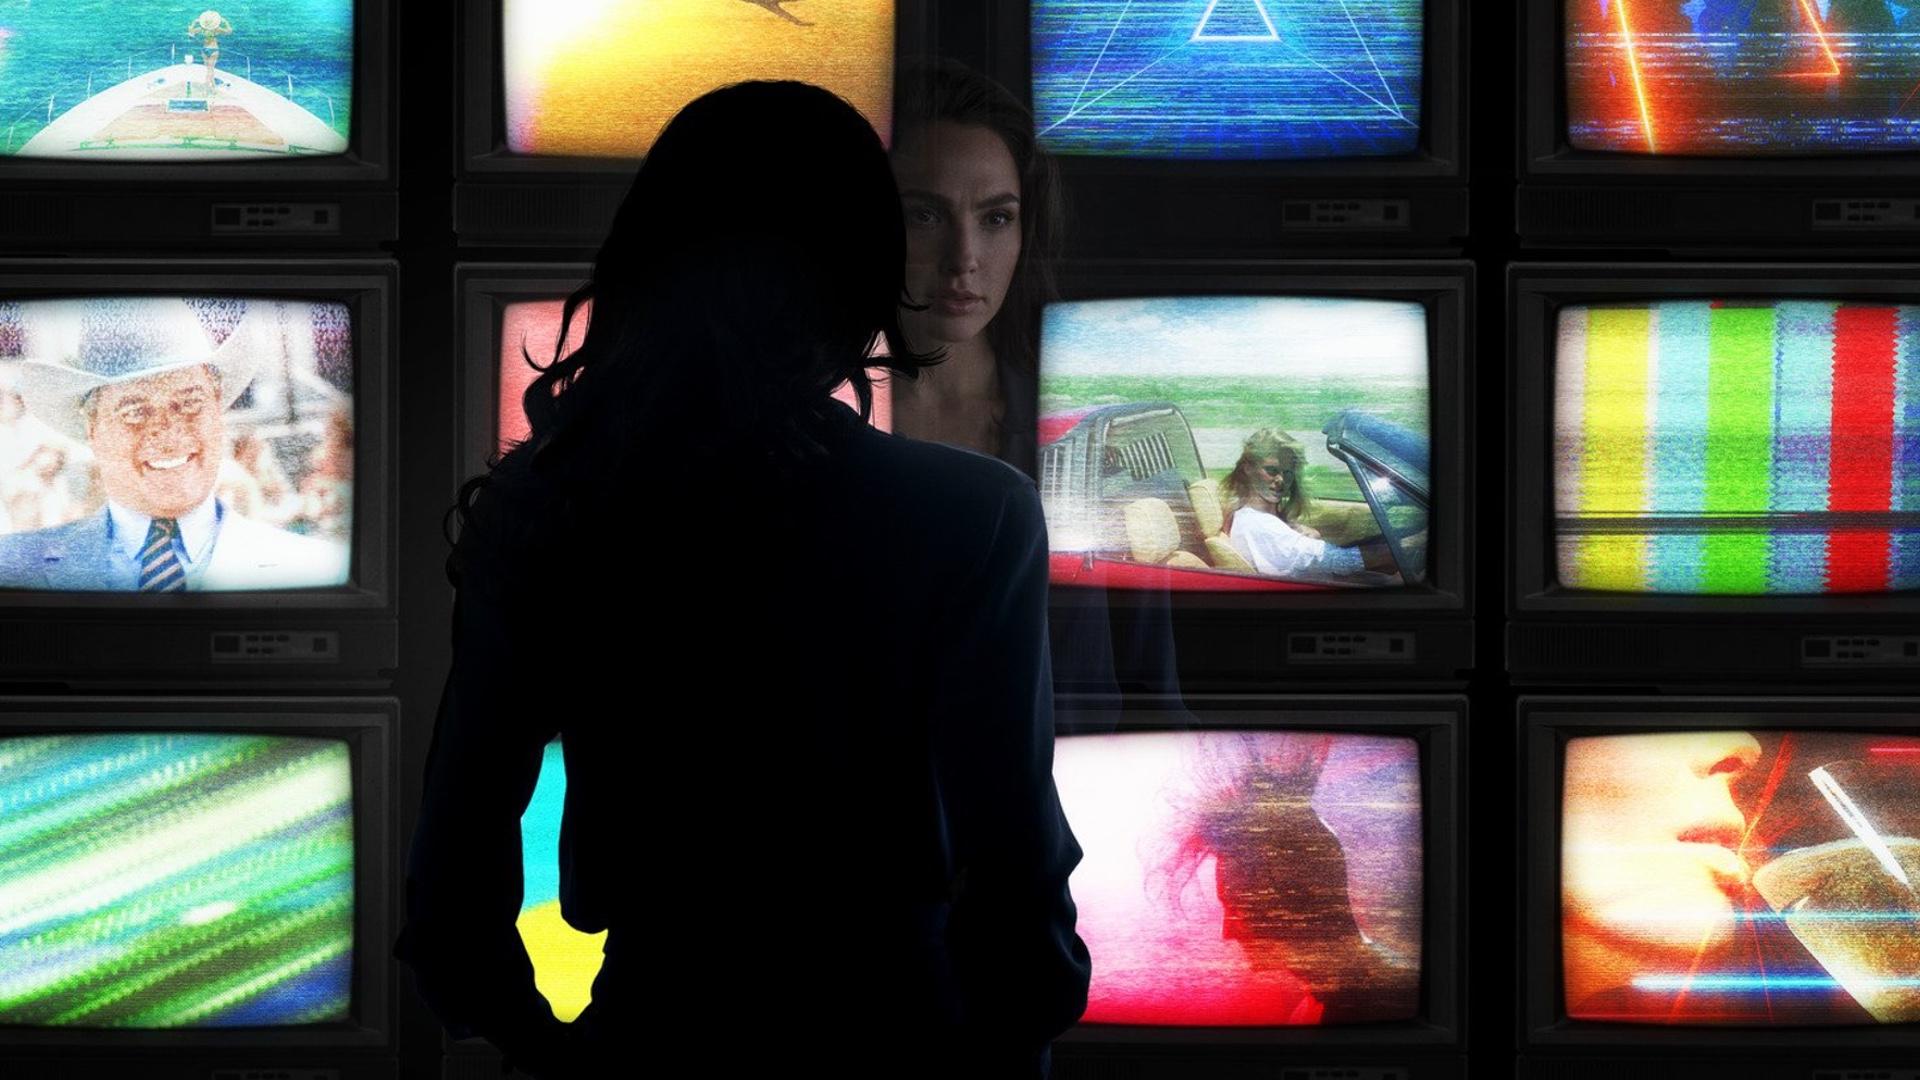 https://cinemaplanet.pt/wp-content/uploads/2018/07/wonder-woman-1984.jpg